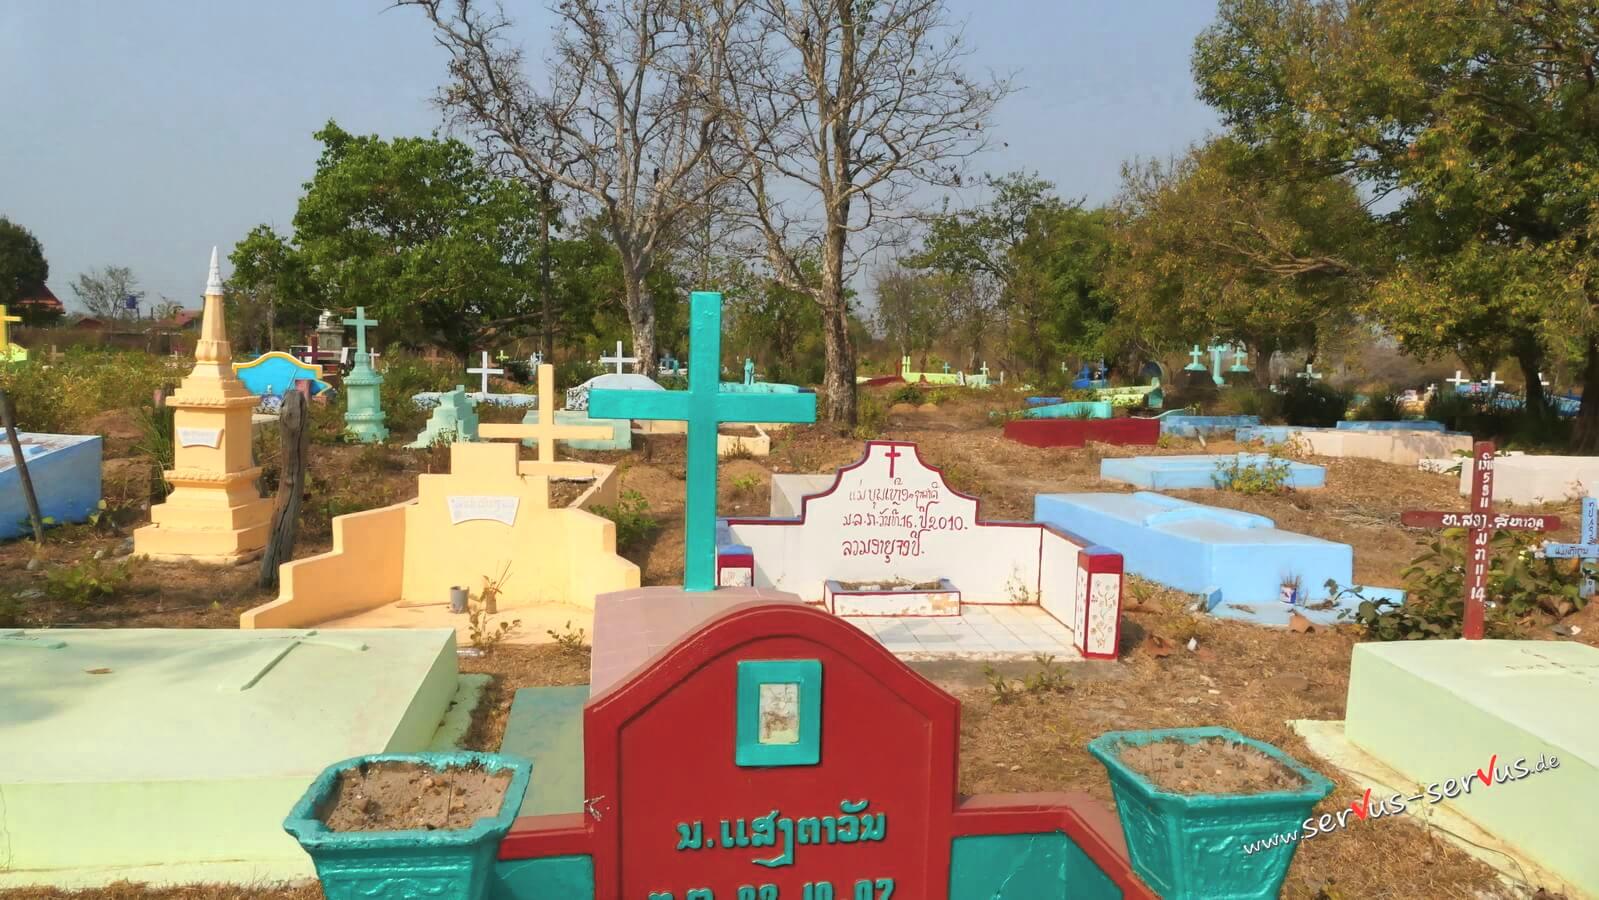 Ein katholischer Friedhof am Wegrand in Laos